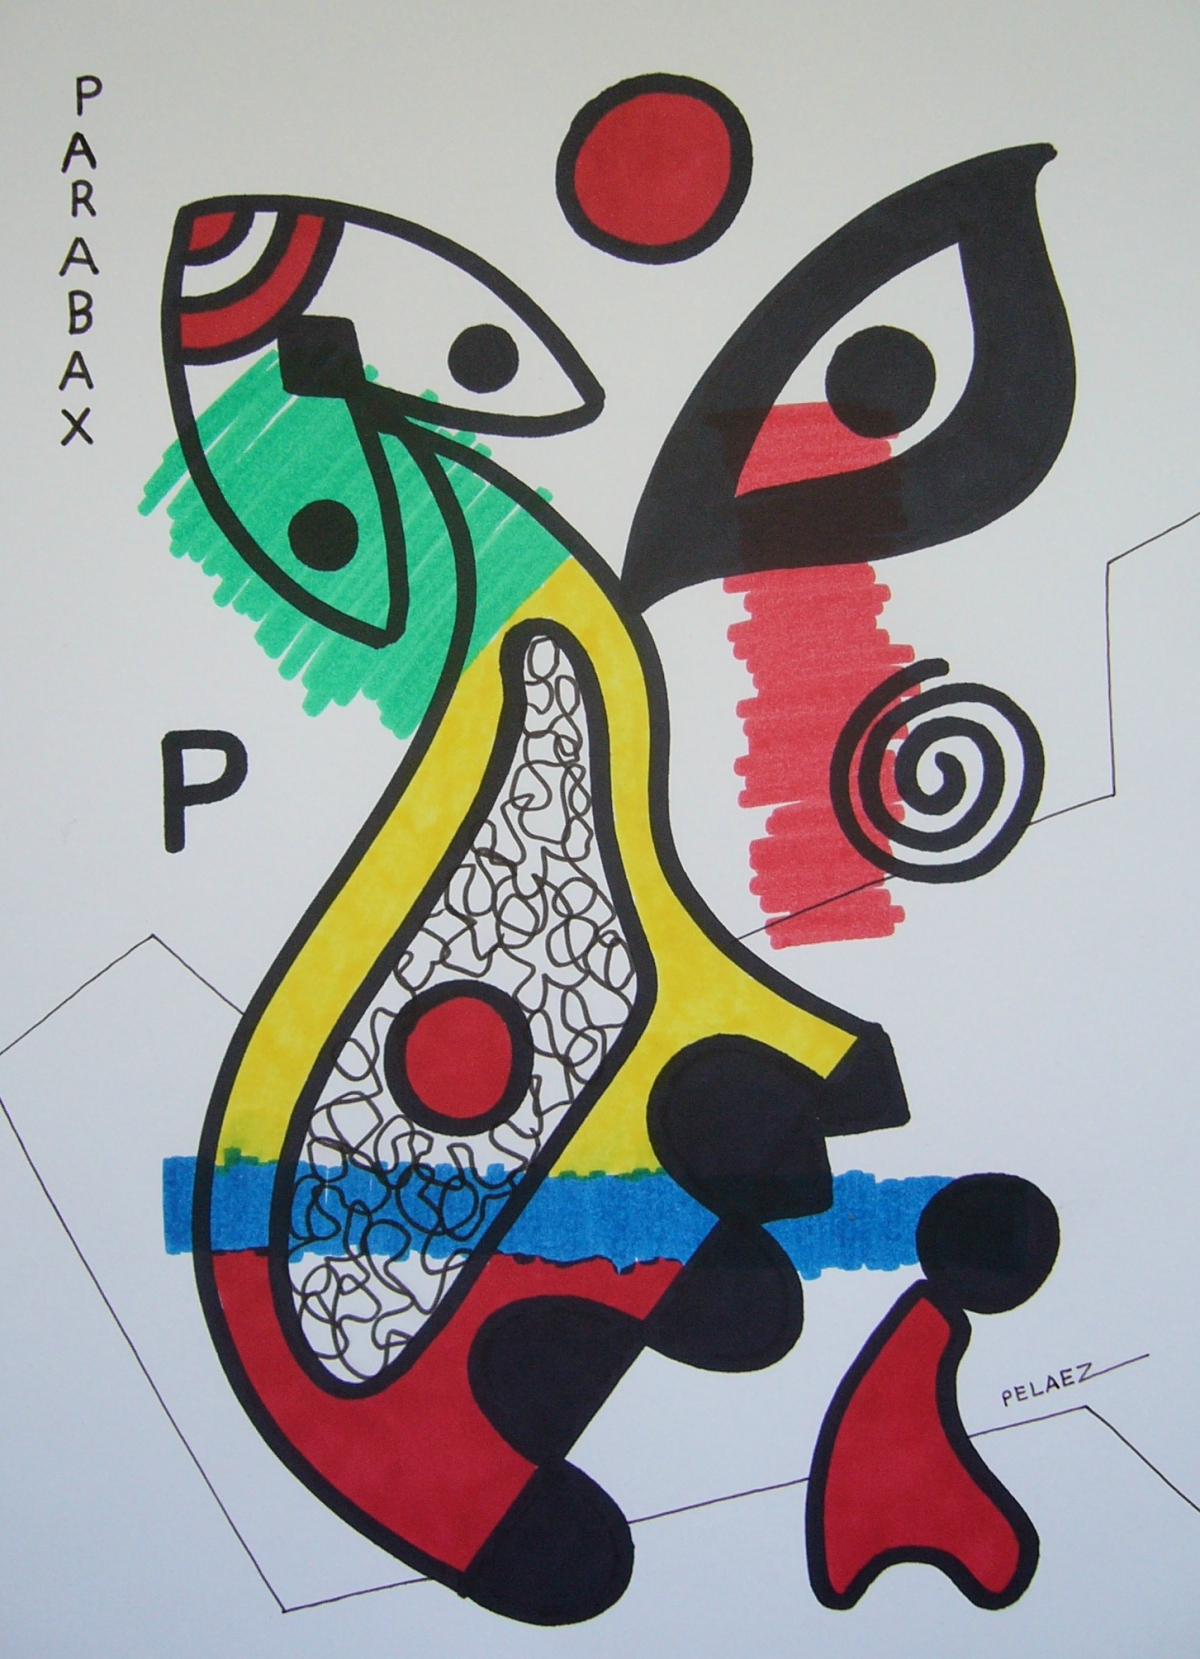 PARABAX